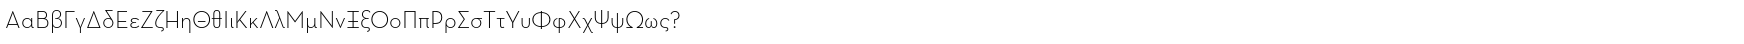 NeutraText-Light.otf